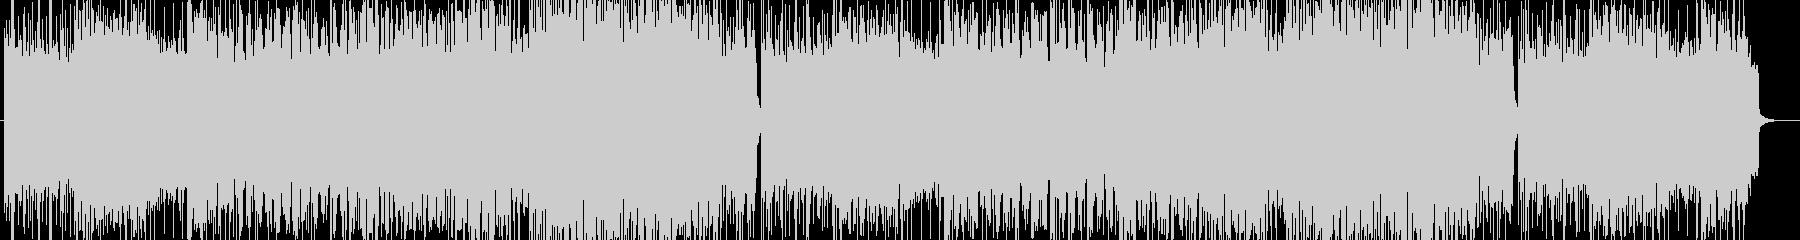 「HR/HM」「DARK」BGM82の未再生の波形